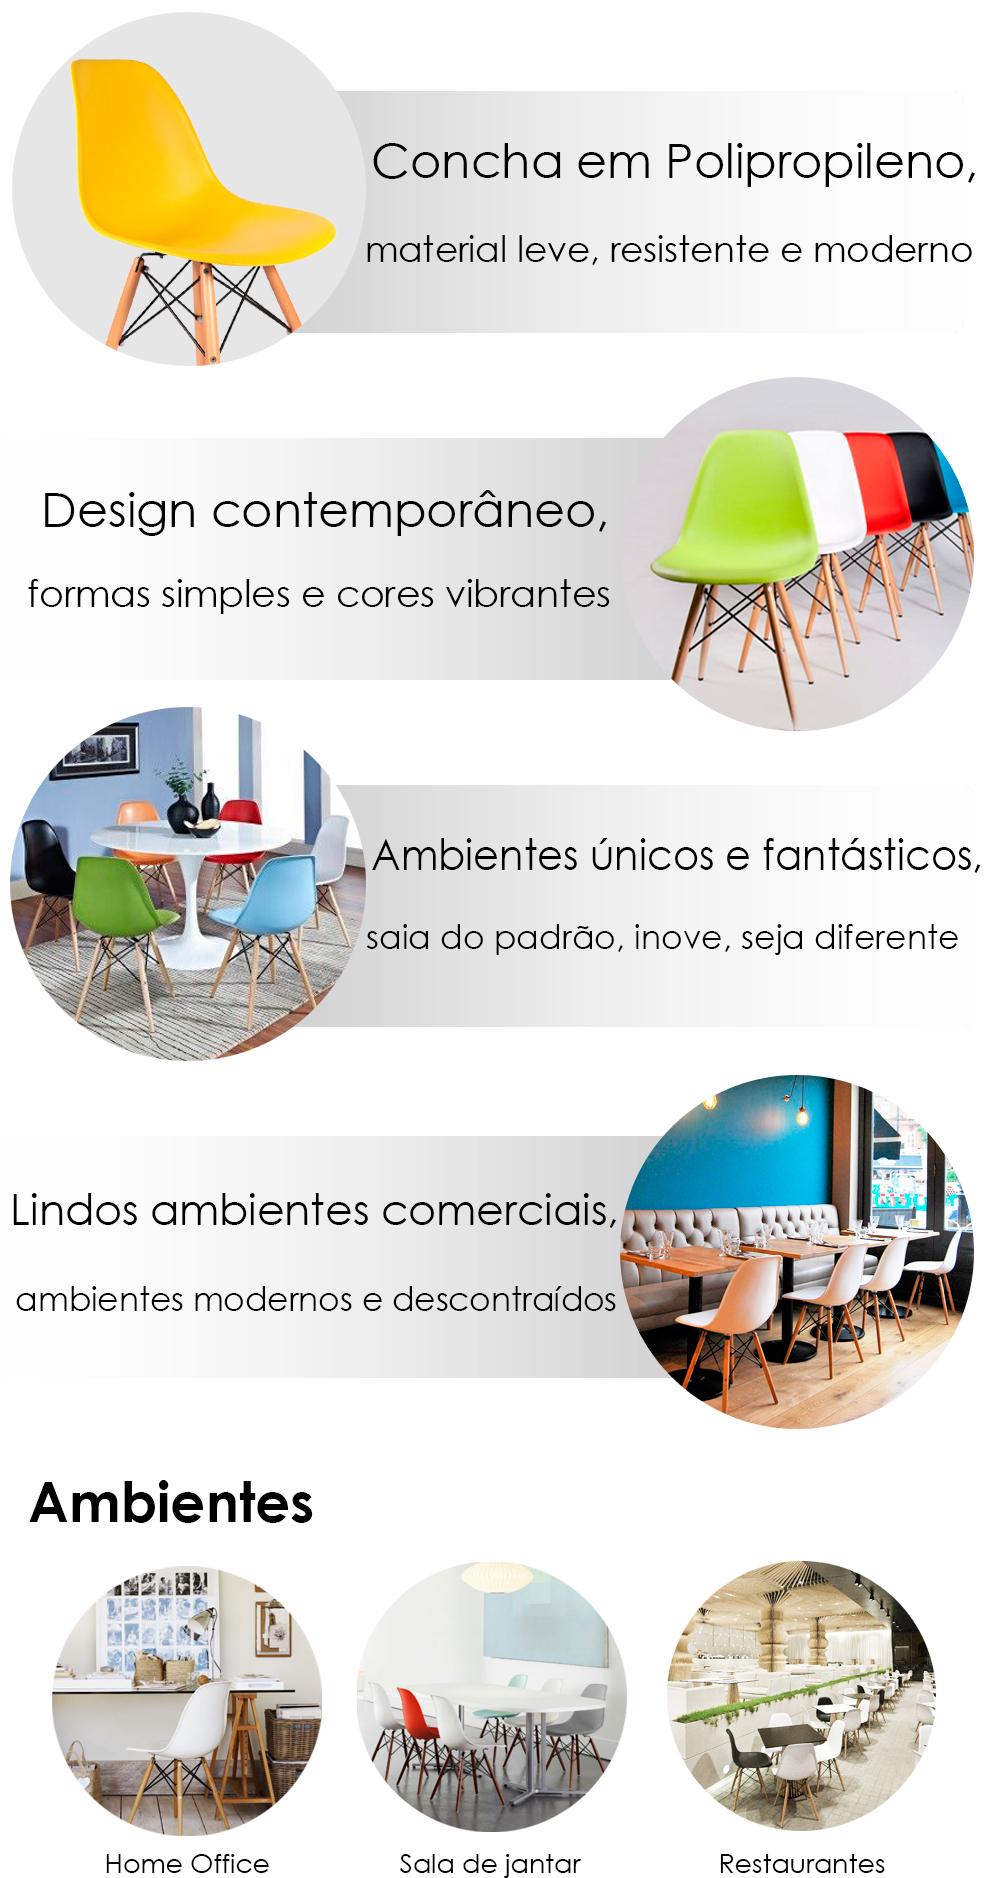 Ambiente com Cadeira Bertoia, Cadeira Bertoia em Ambiente, Cadeira Bertoia Bella Brasil Decor, Banner Bertoia,